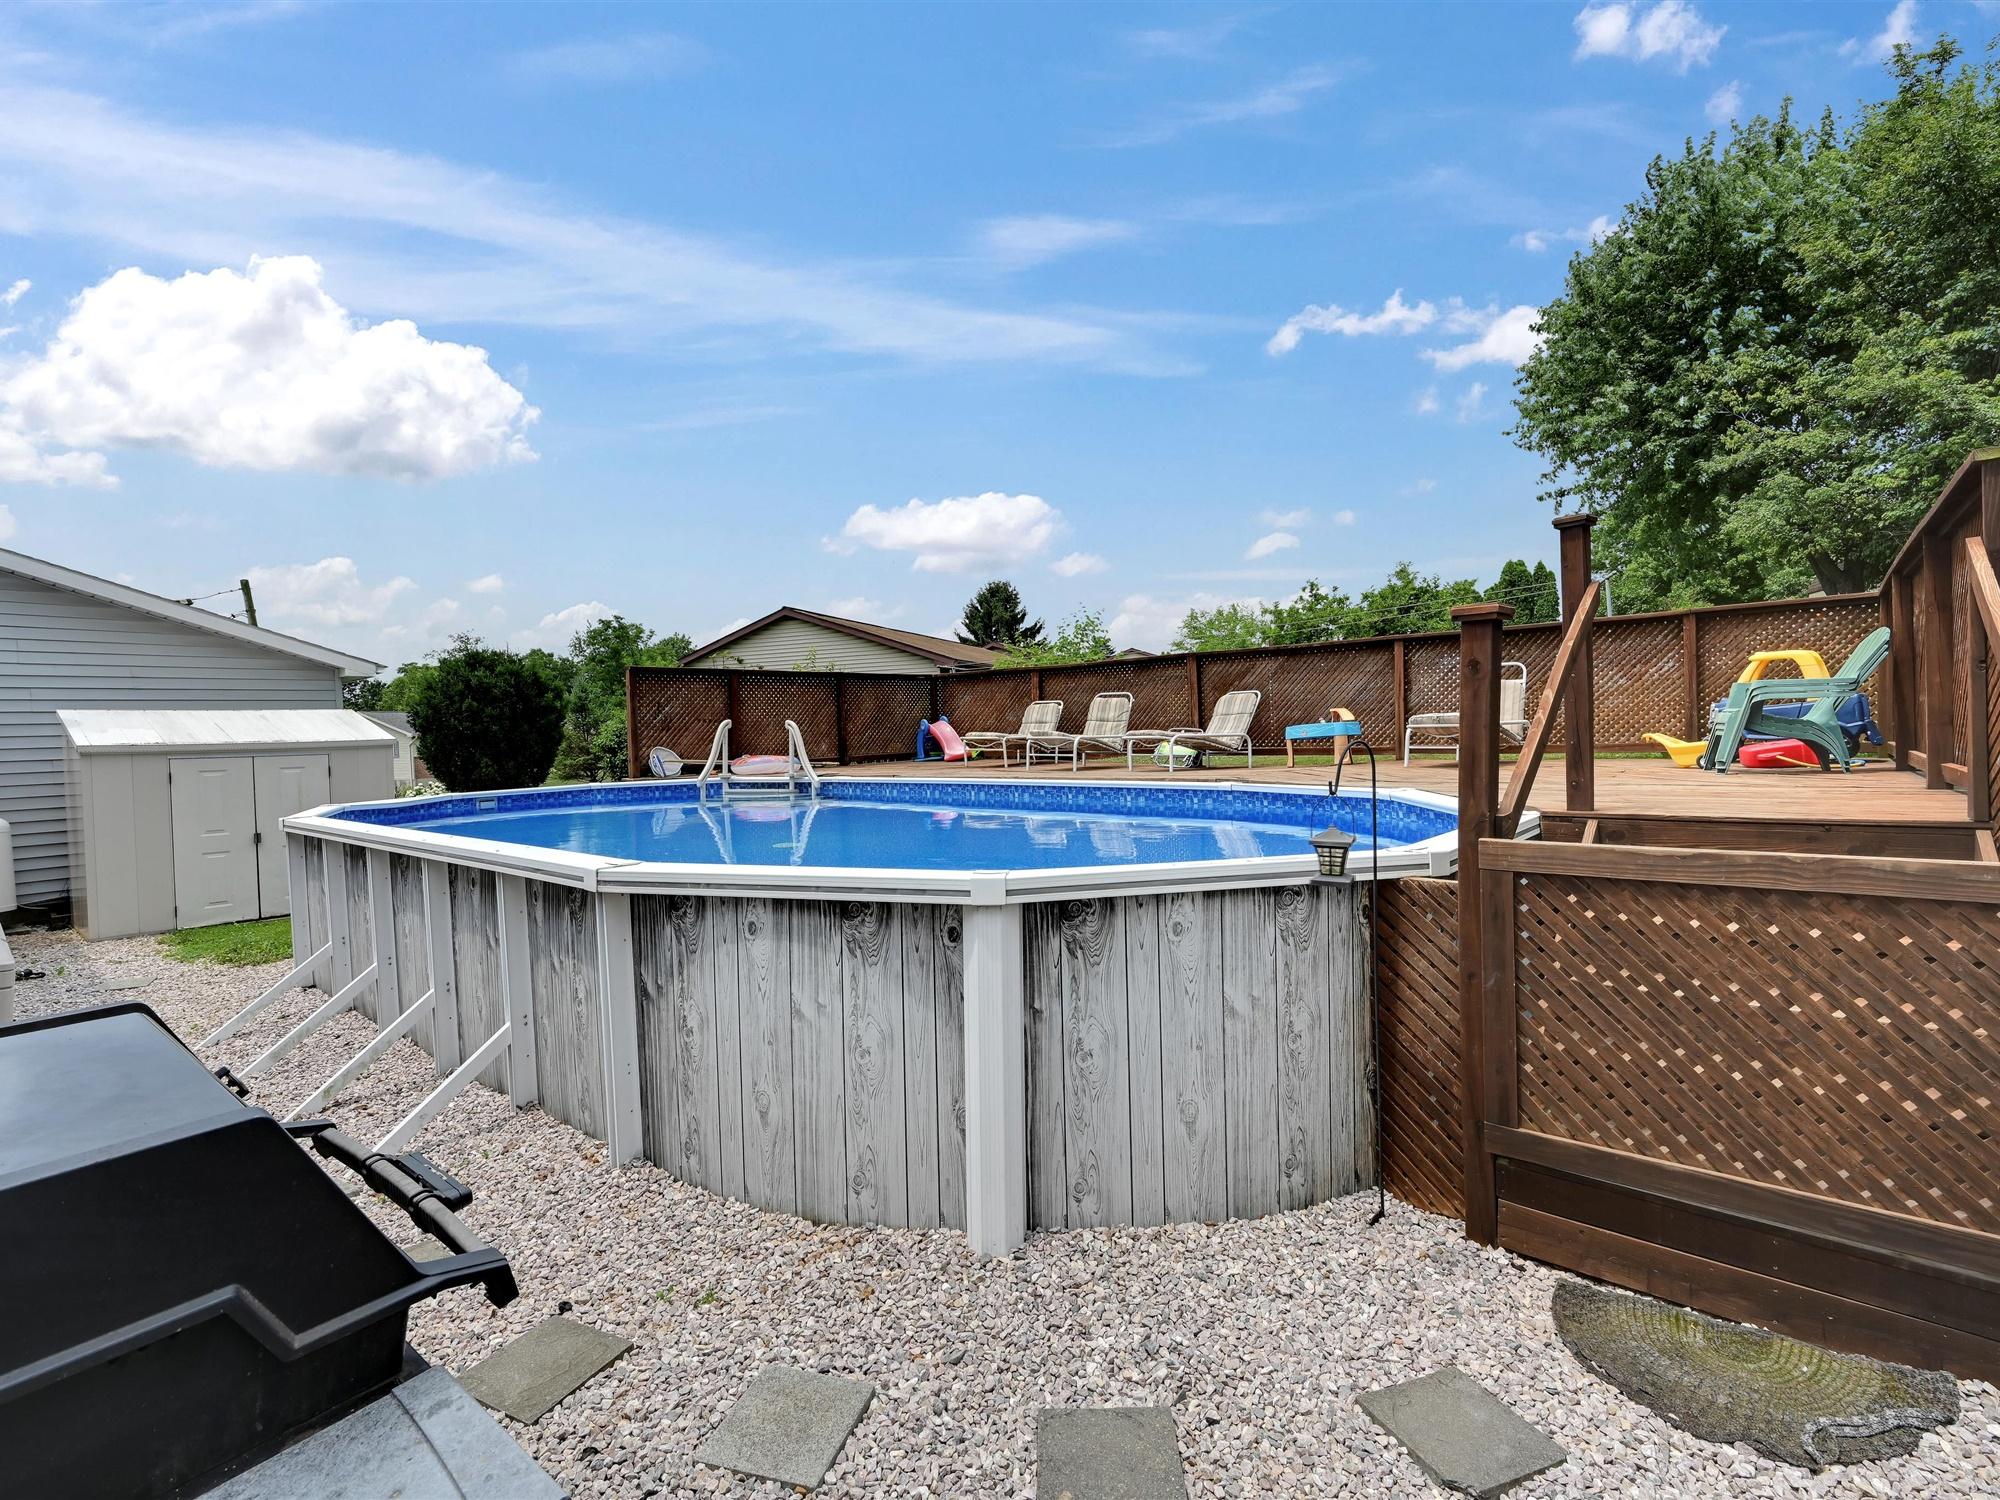 1617 Greenwood Dr. - pool view 1